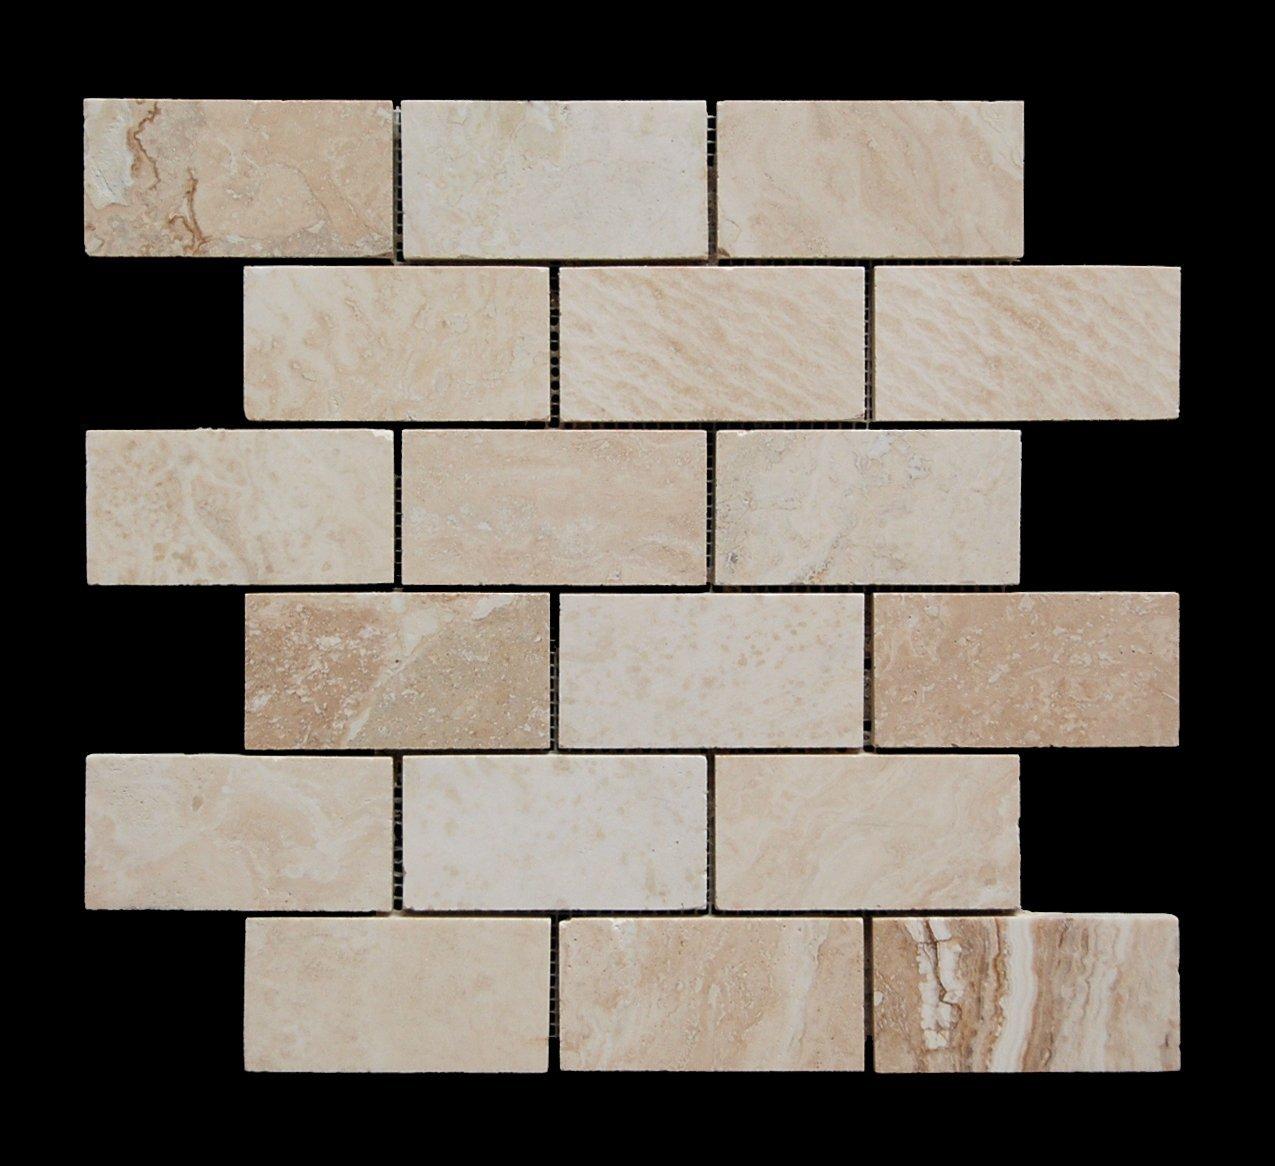 Romano 2X4 Filled and Honed Travertine Brick Mosaic Tile